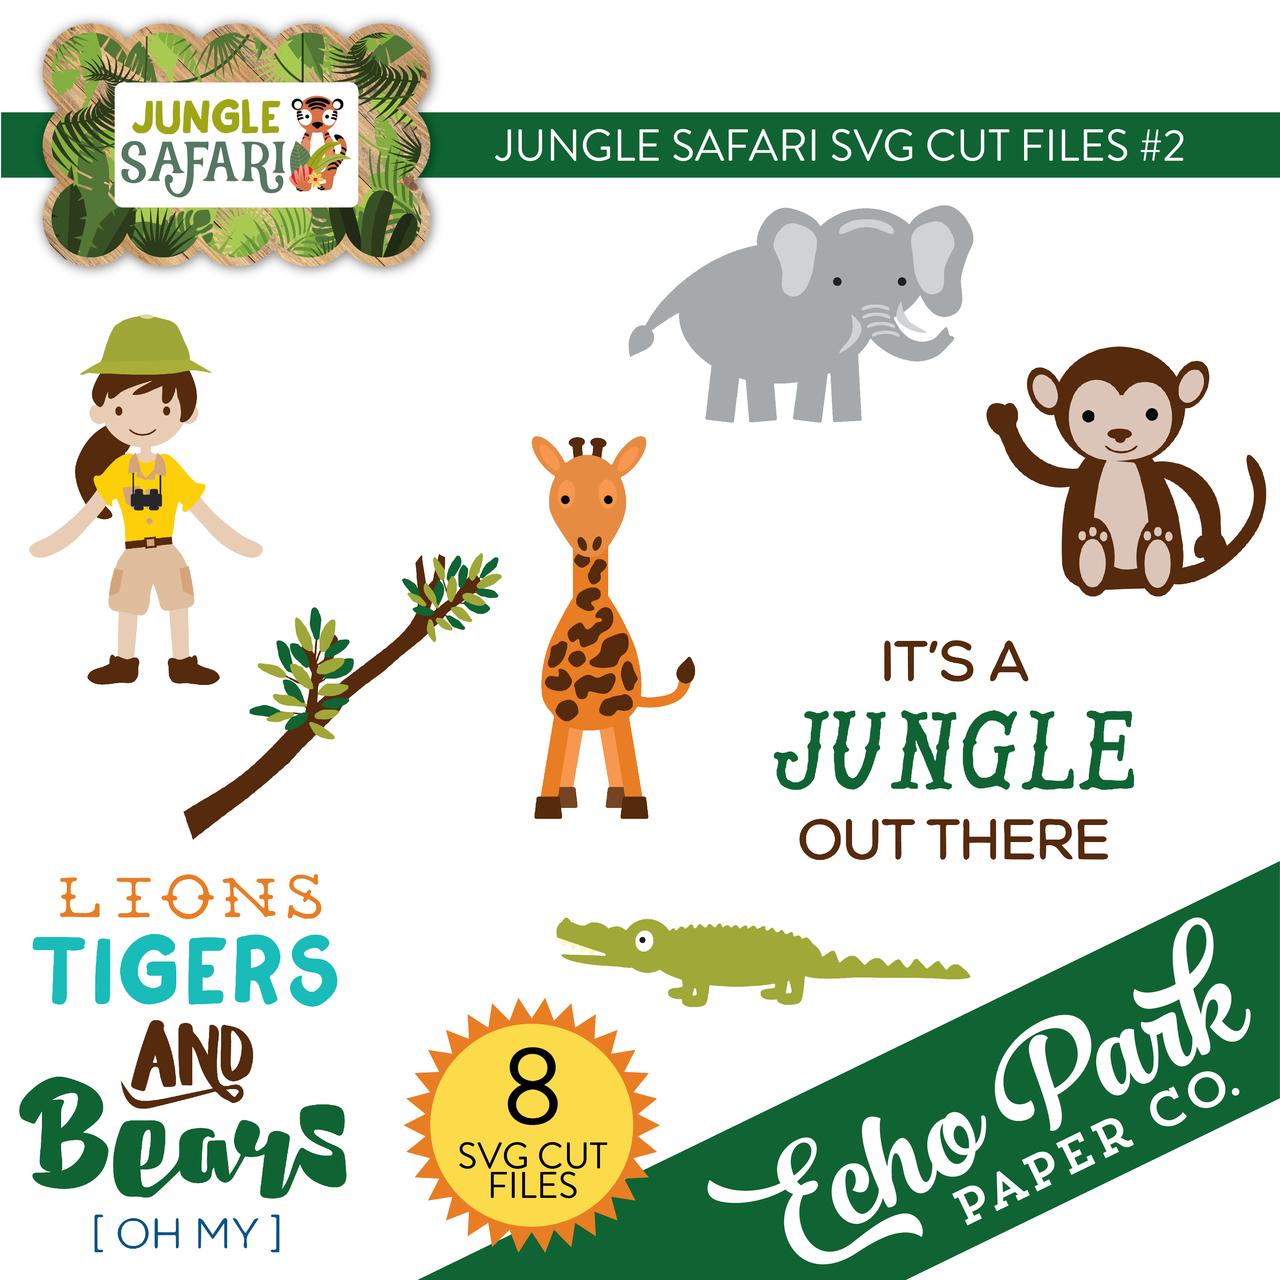 Jungle Safari SVG Cut Files #2